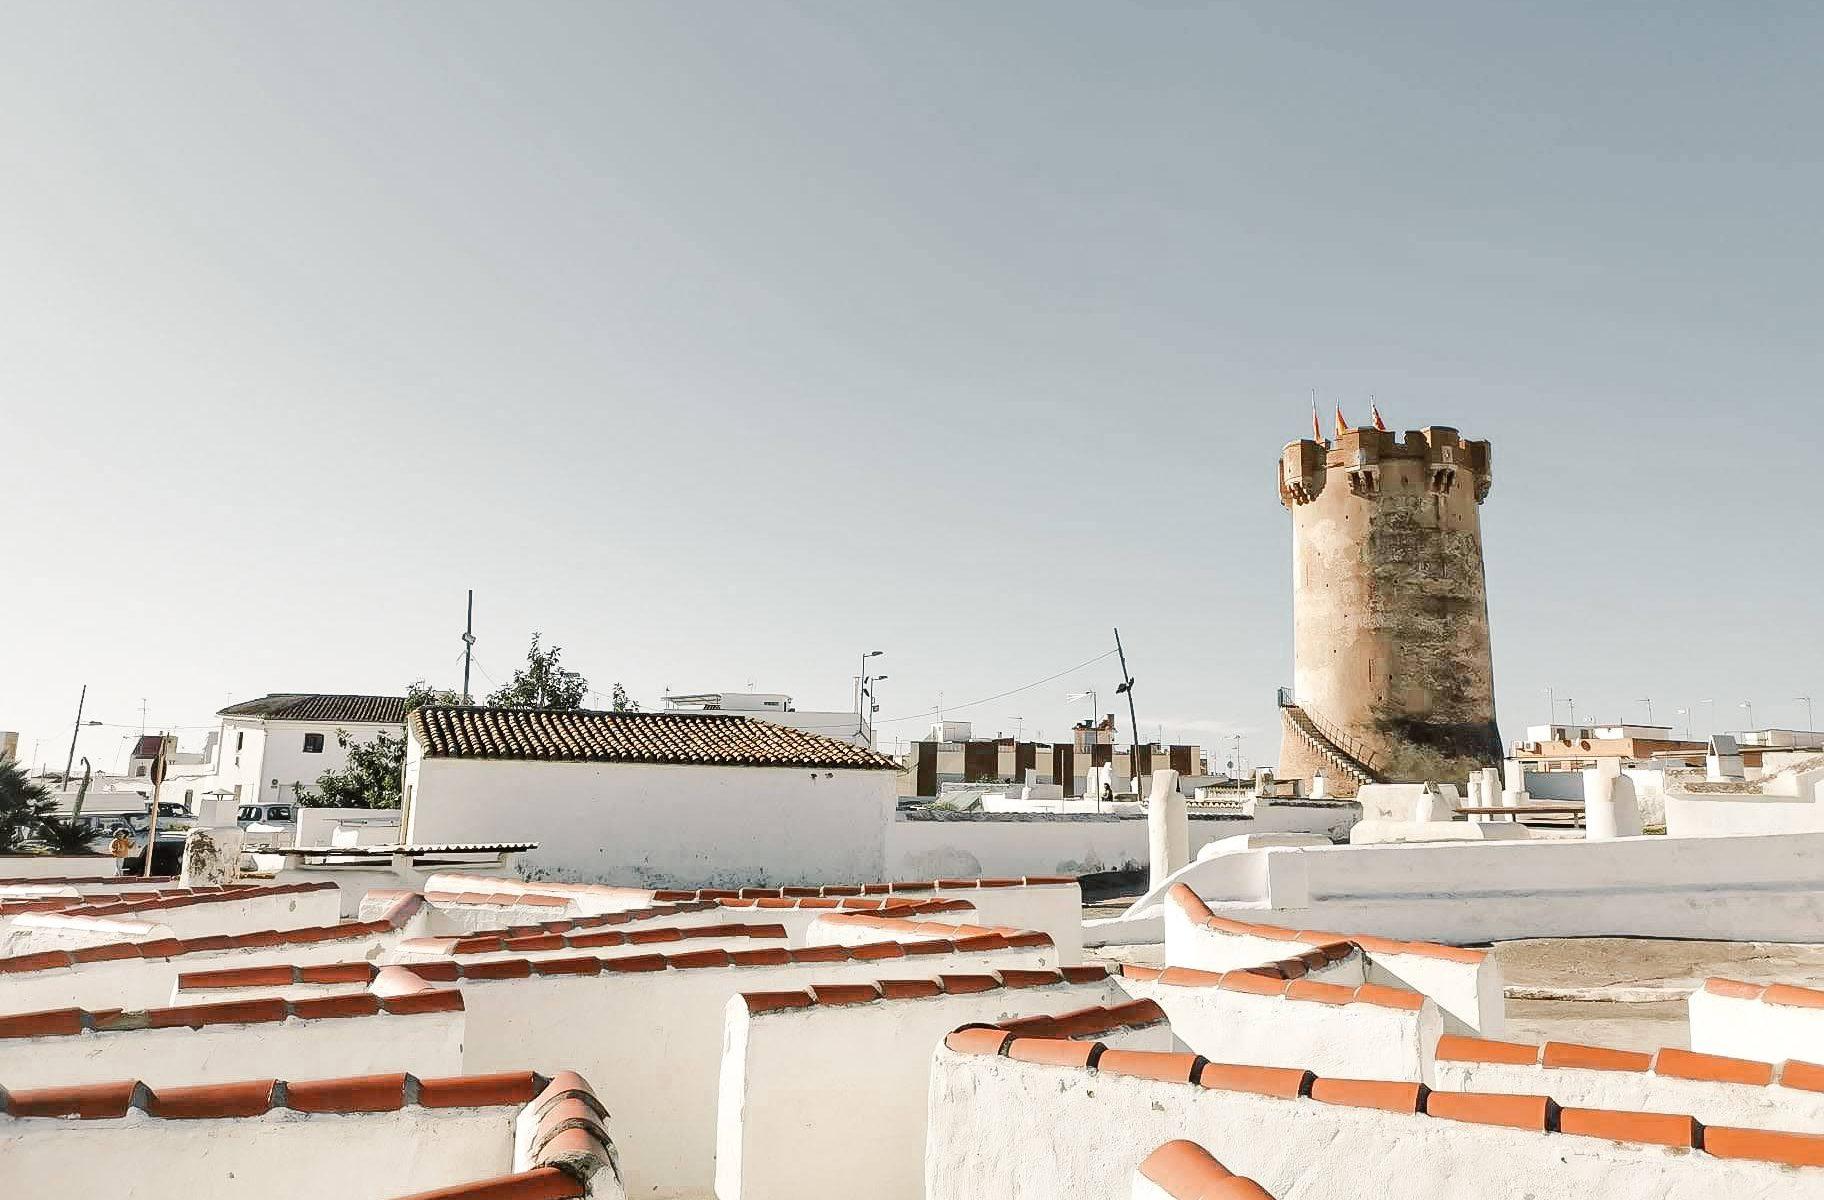 Torre e cavernas de Paterna © lavidaesmara